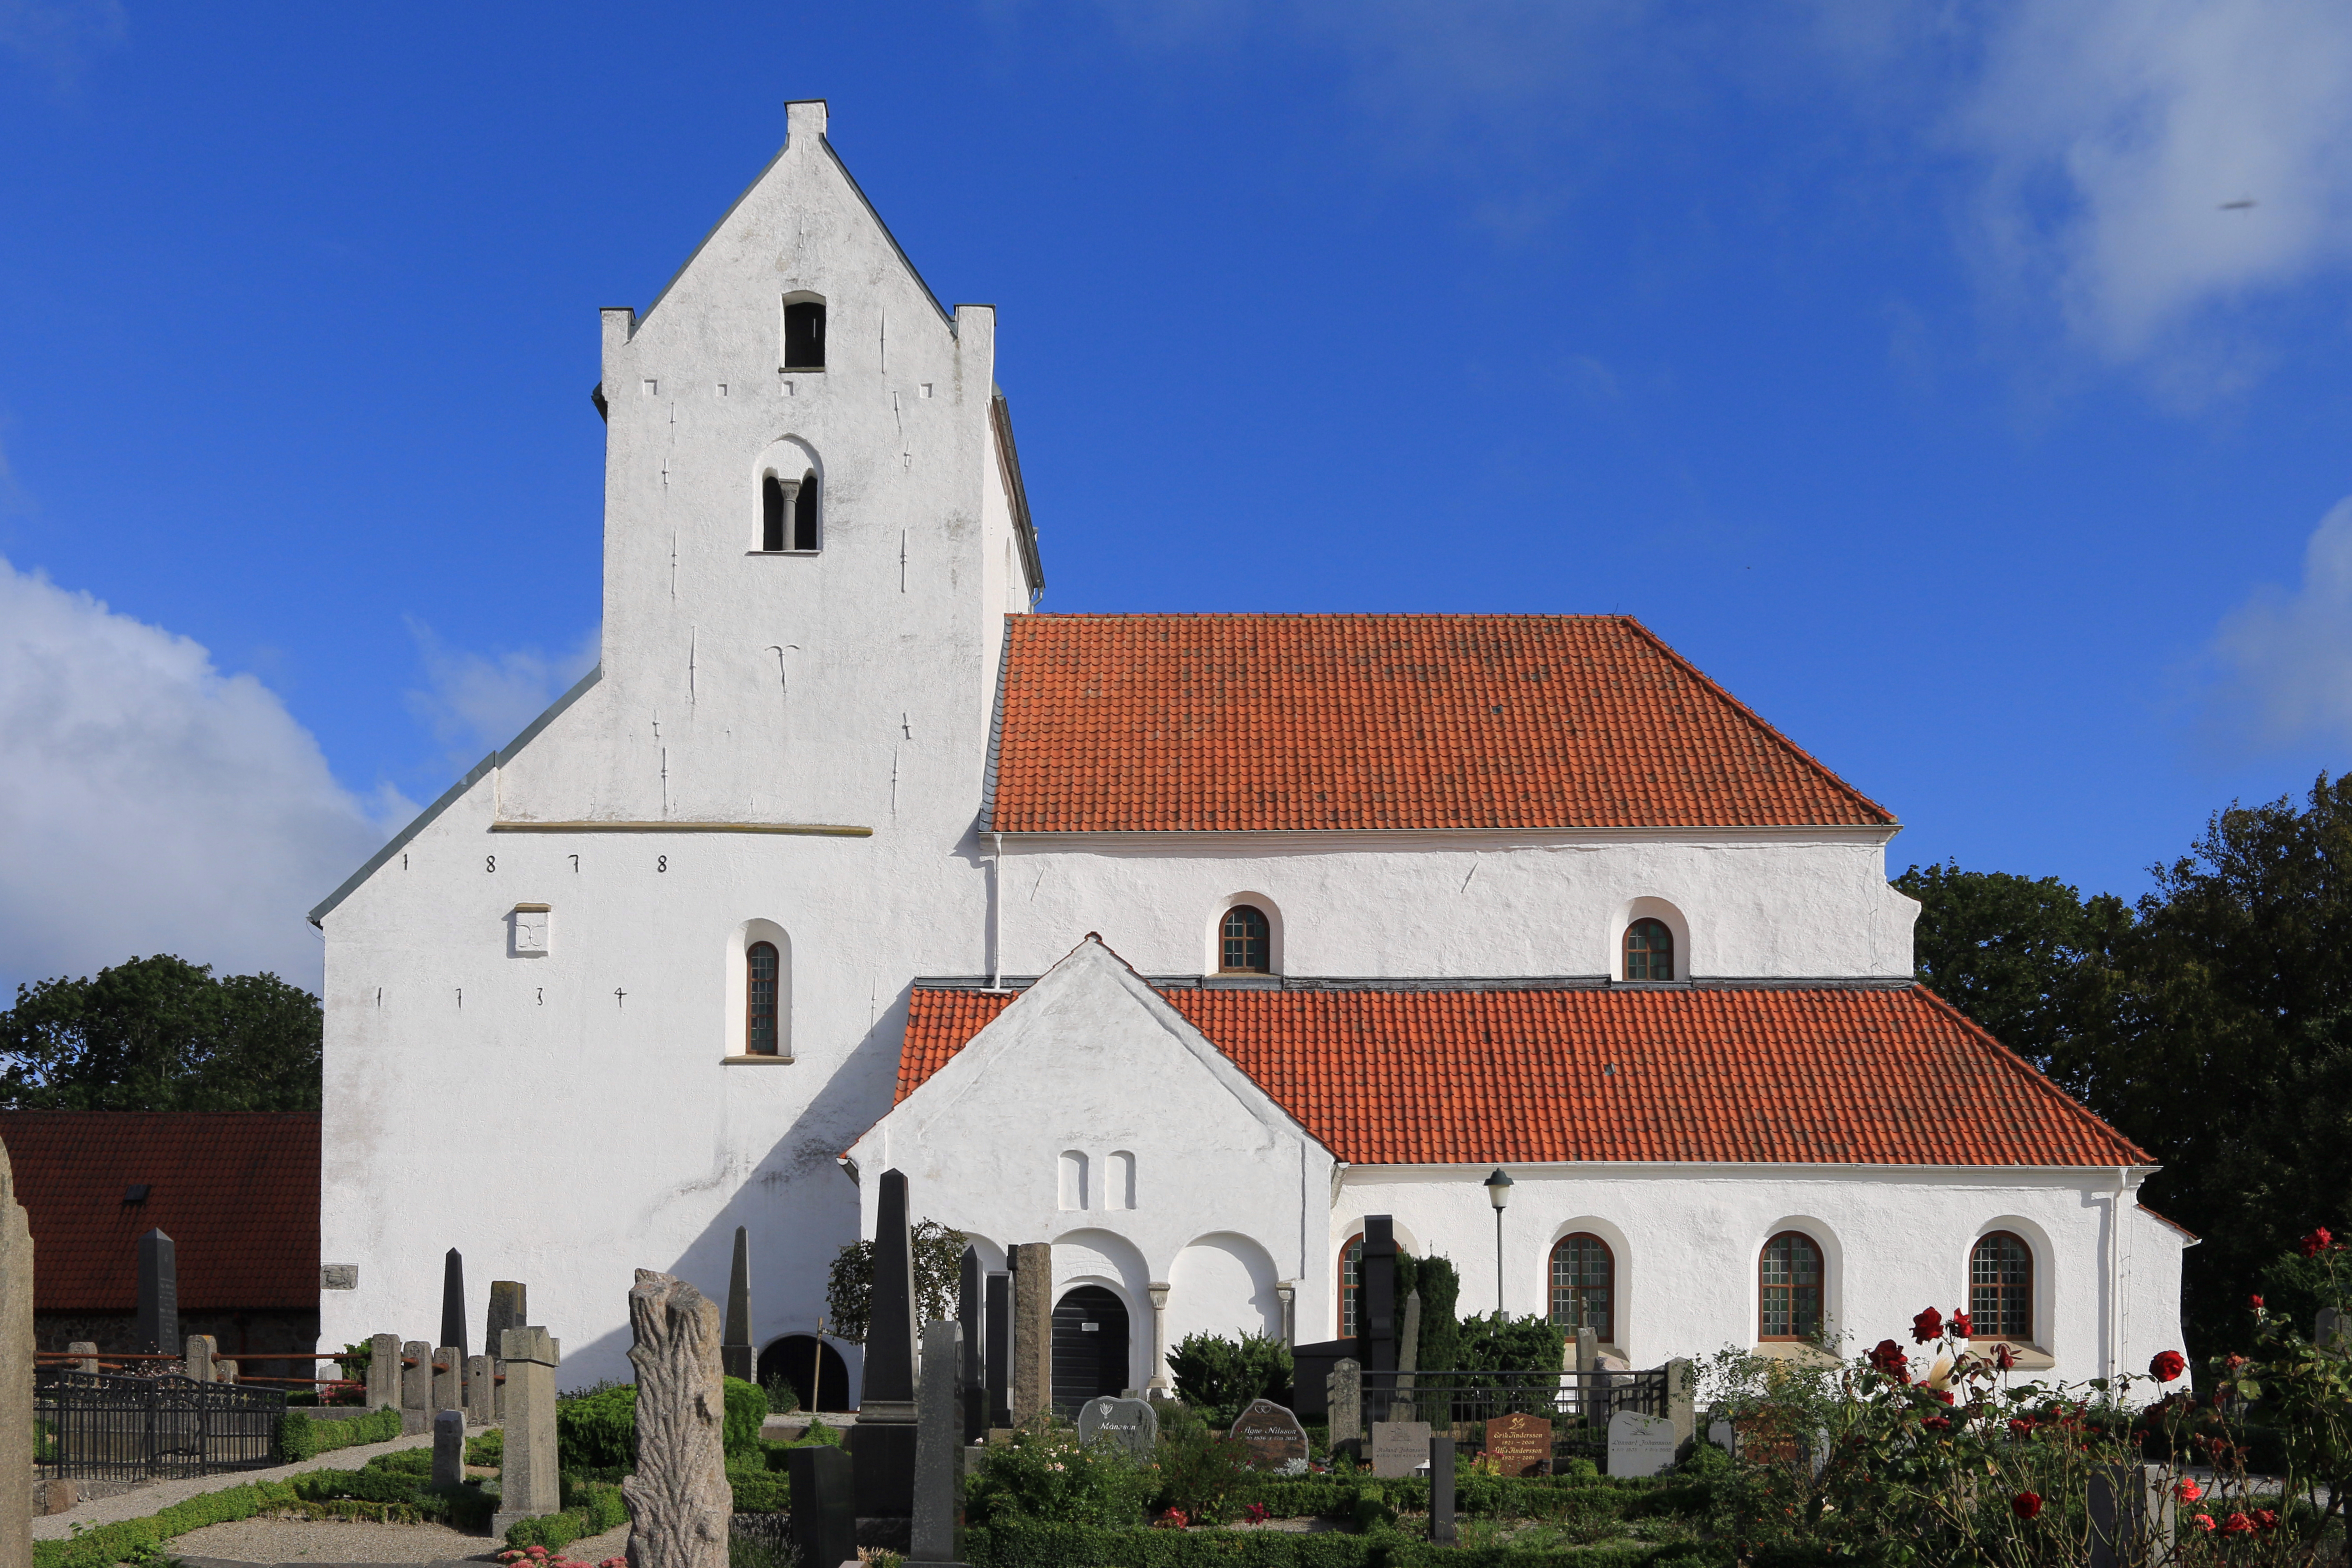 Dalby Heligkorskyrka - Oldest stone church in Scandinavia | GuidebookSweden